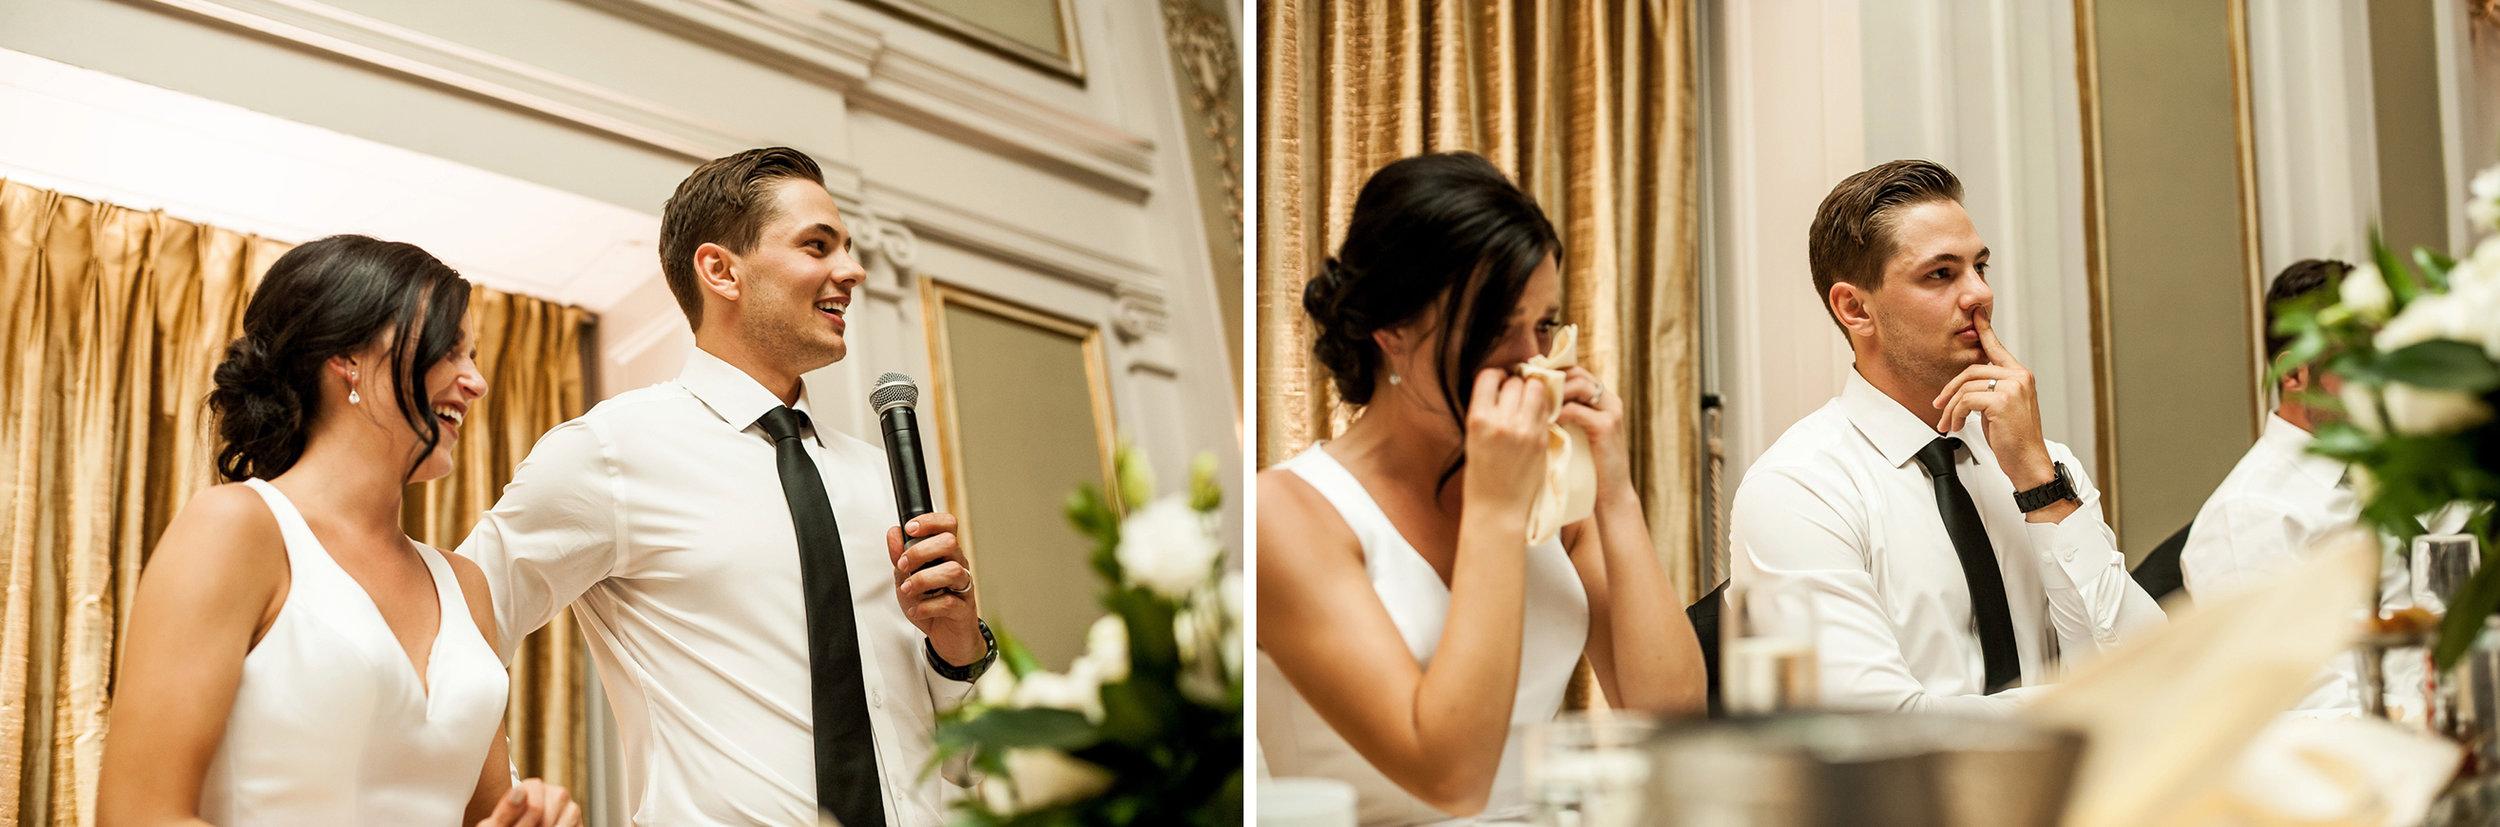 duluth wedding photography.jpg